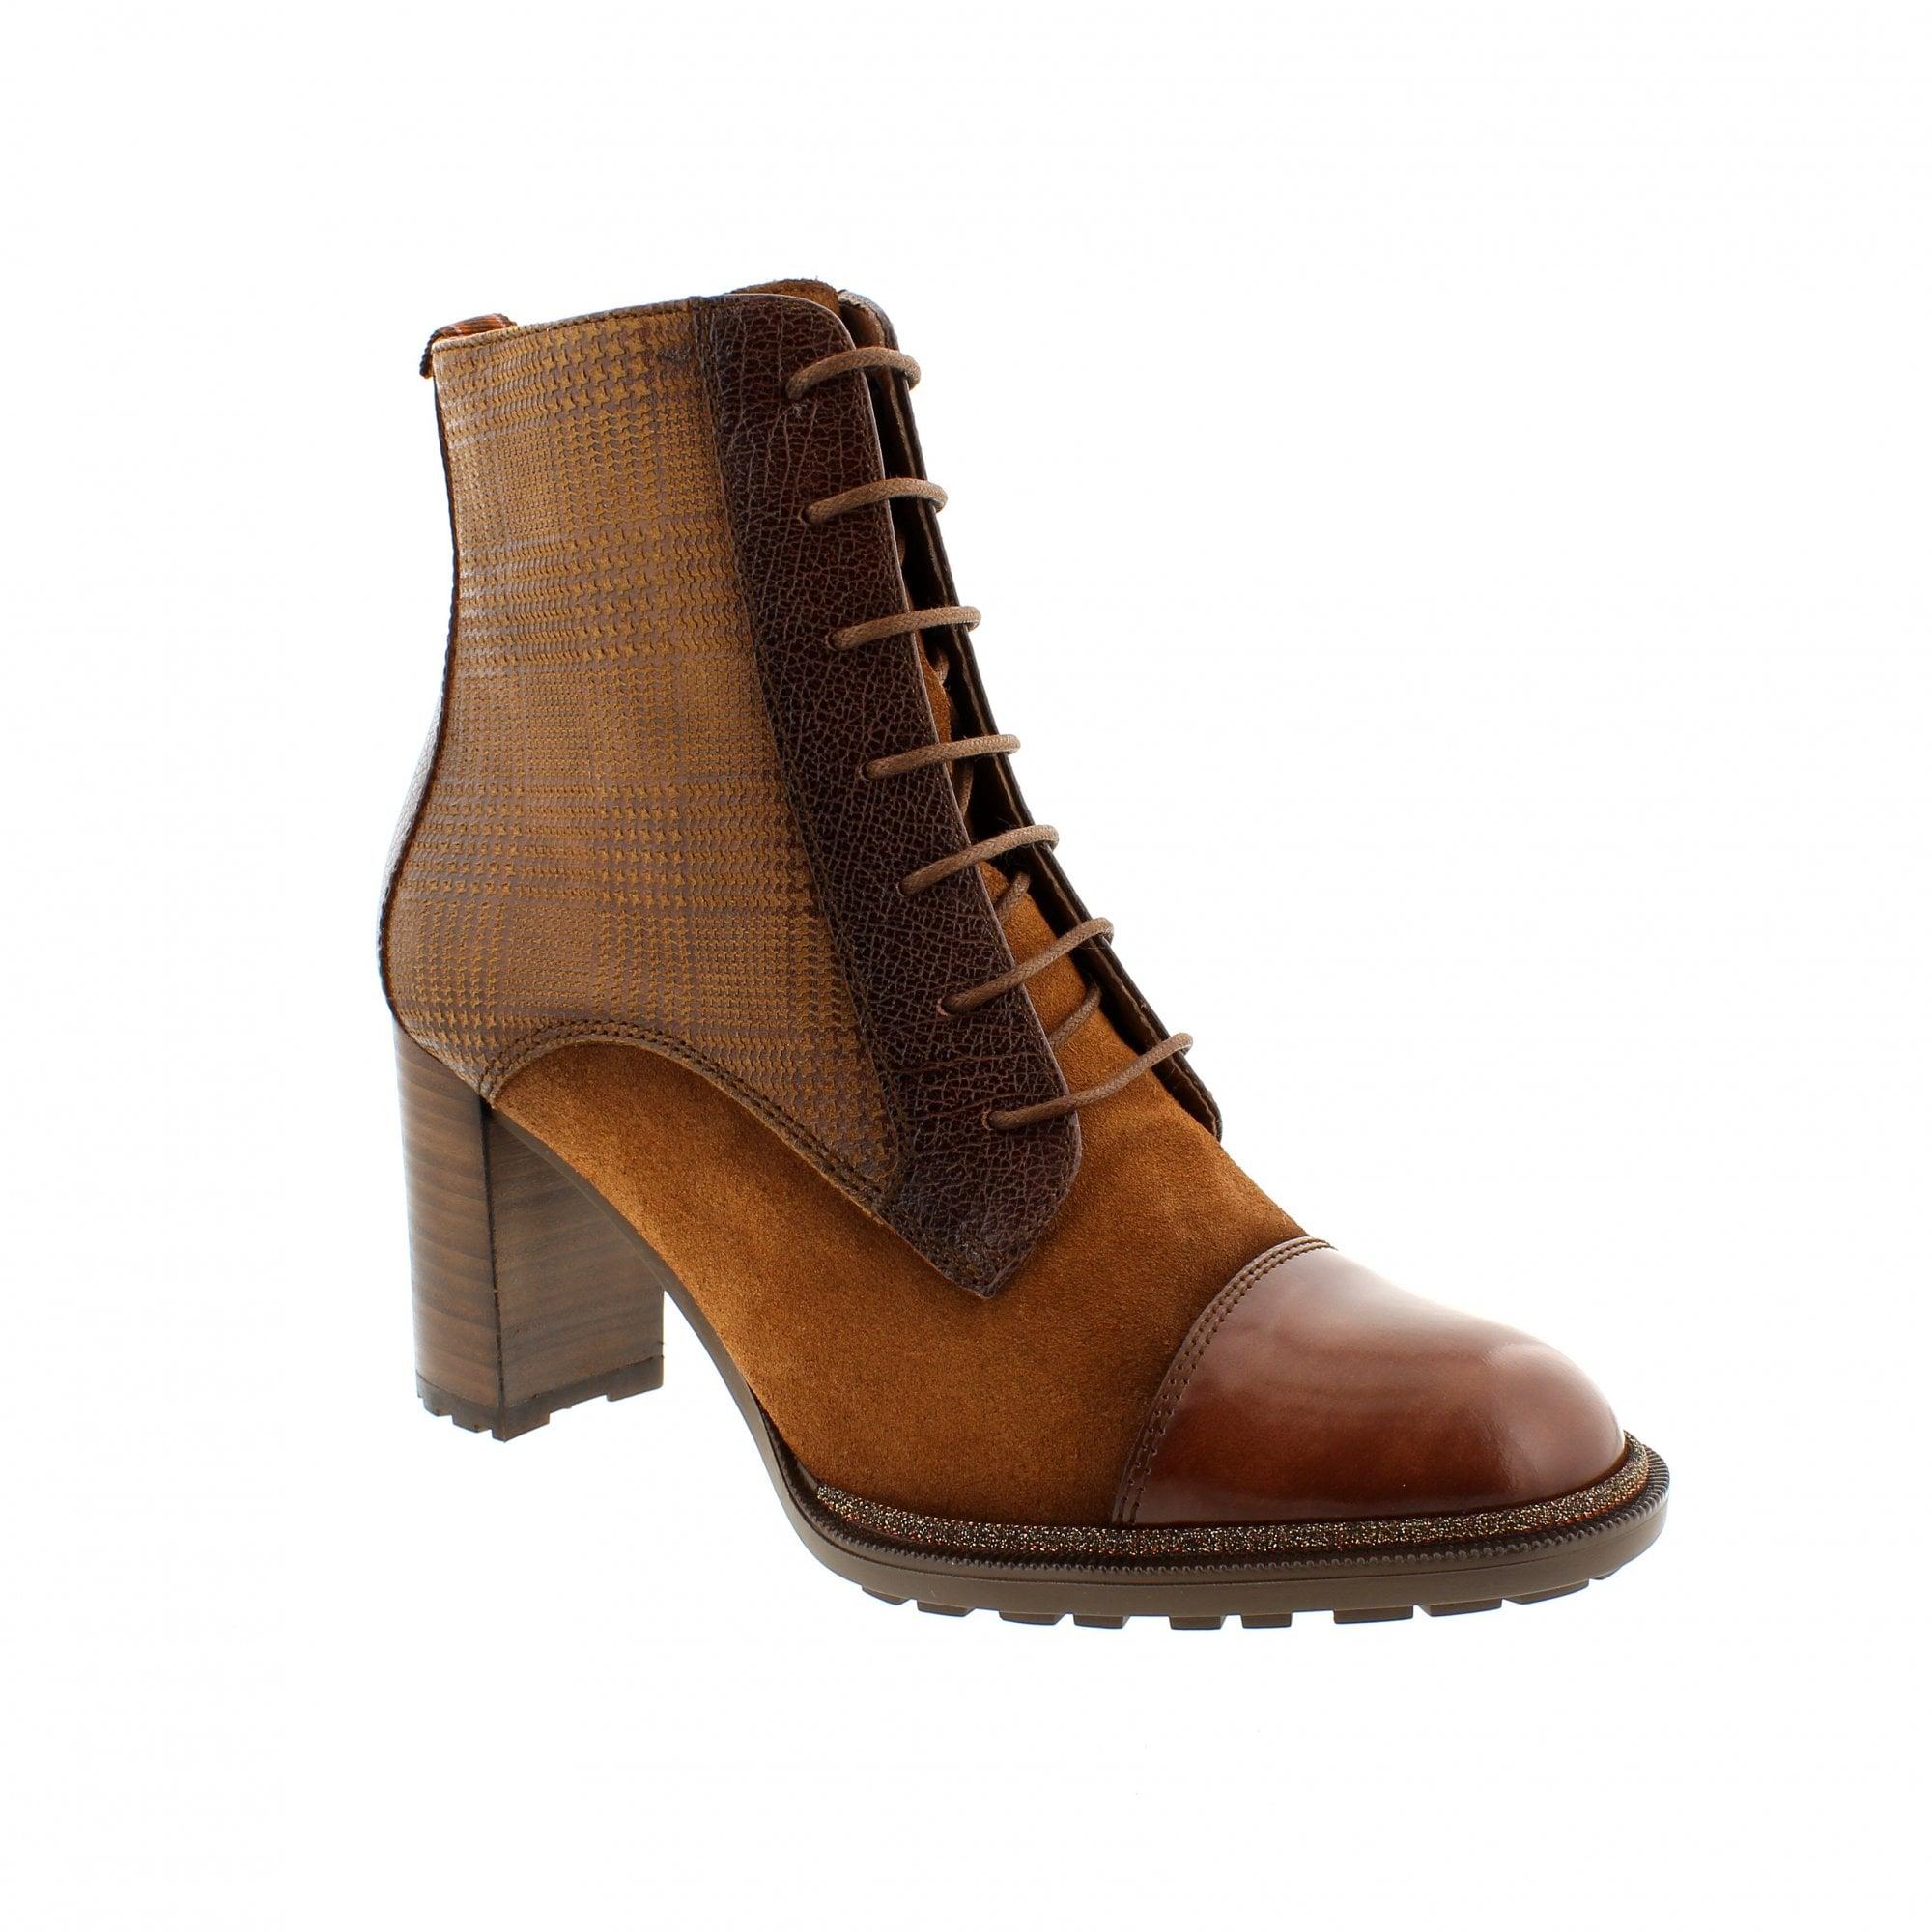 d354335bc9a441 Hispanitas Parsley 87724-v30 Womens Ankle Boots